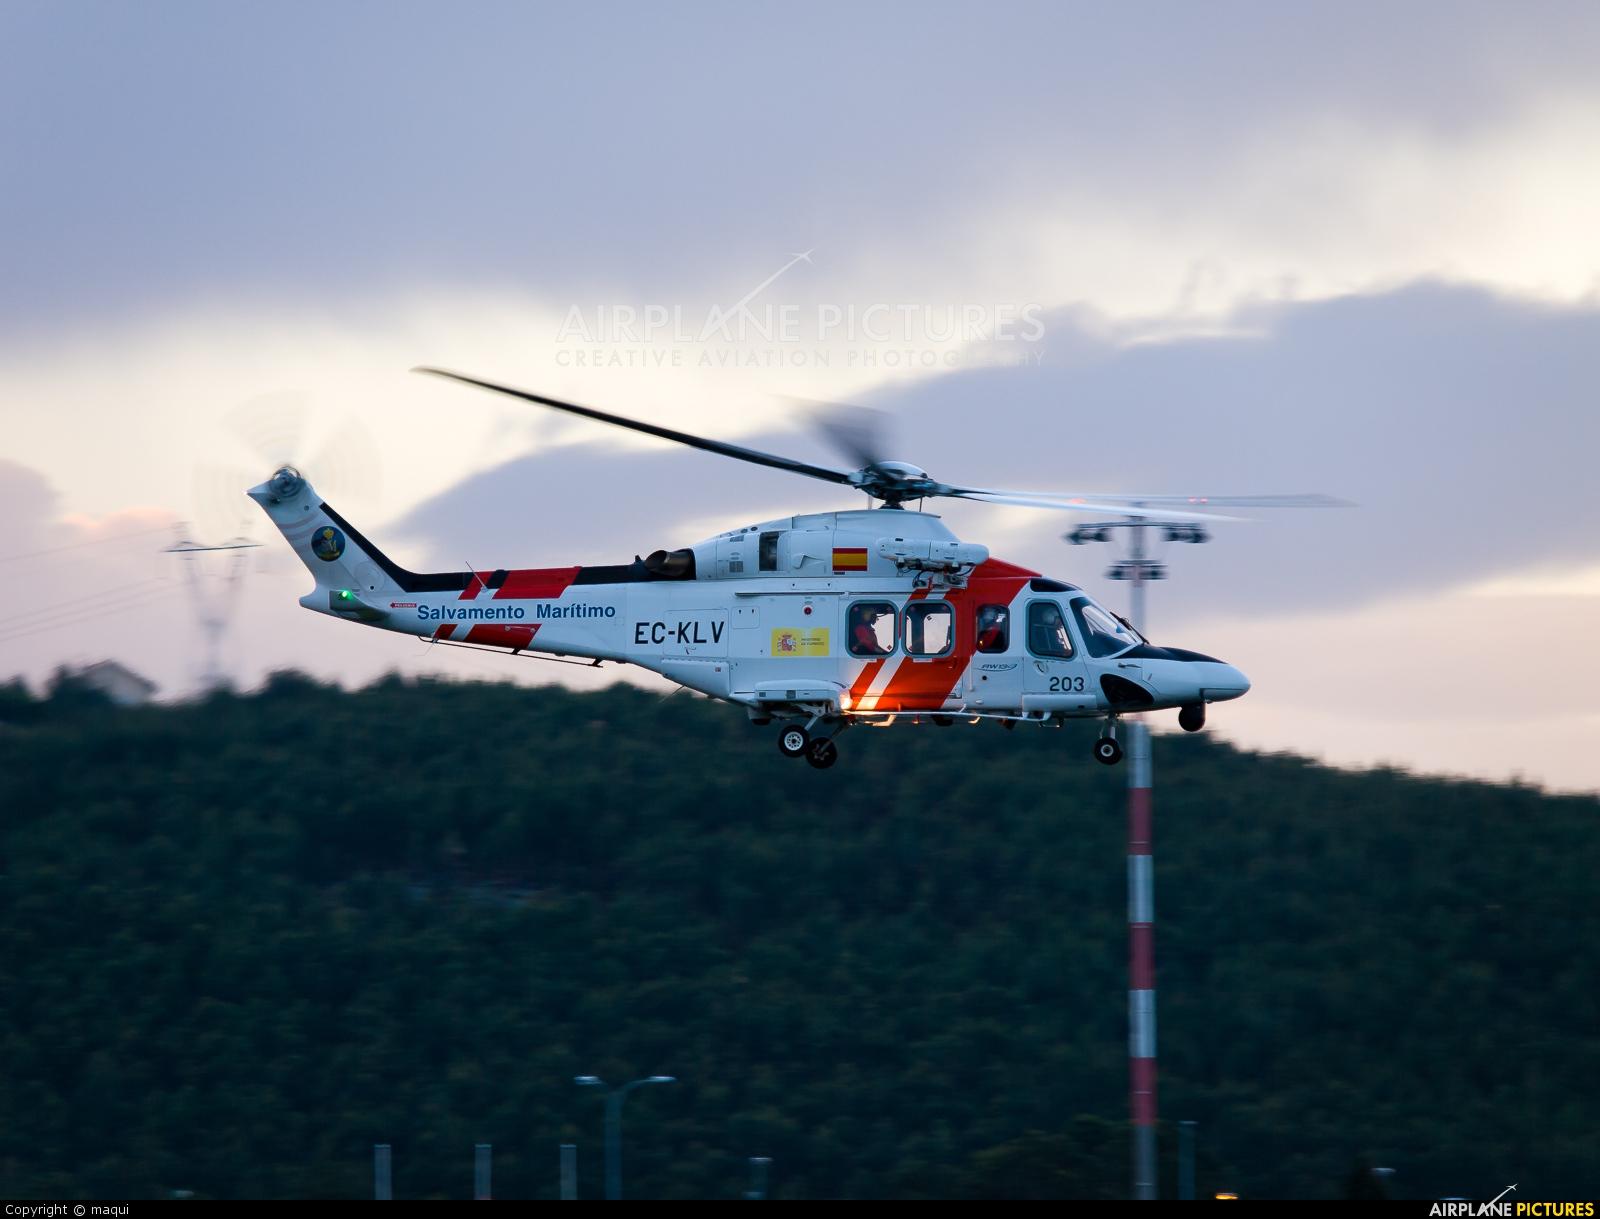 Spain - Coast Guard EC-KLV aircraft at La Coruña